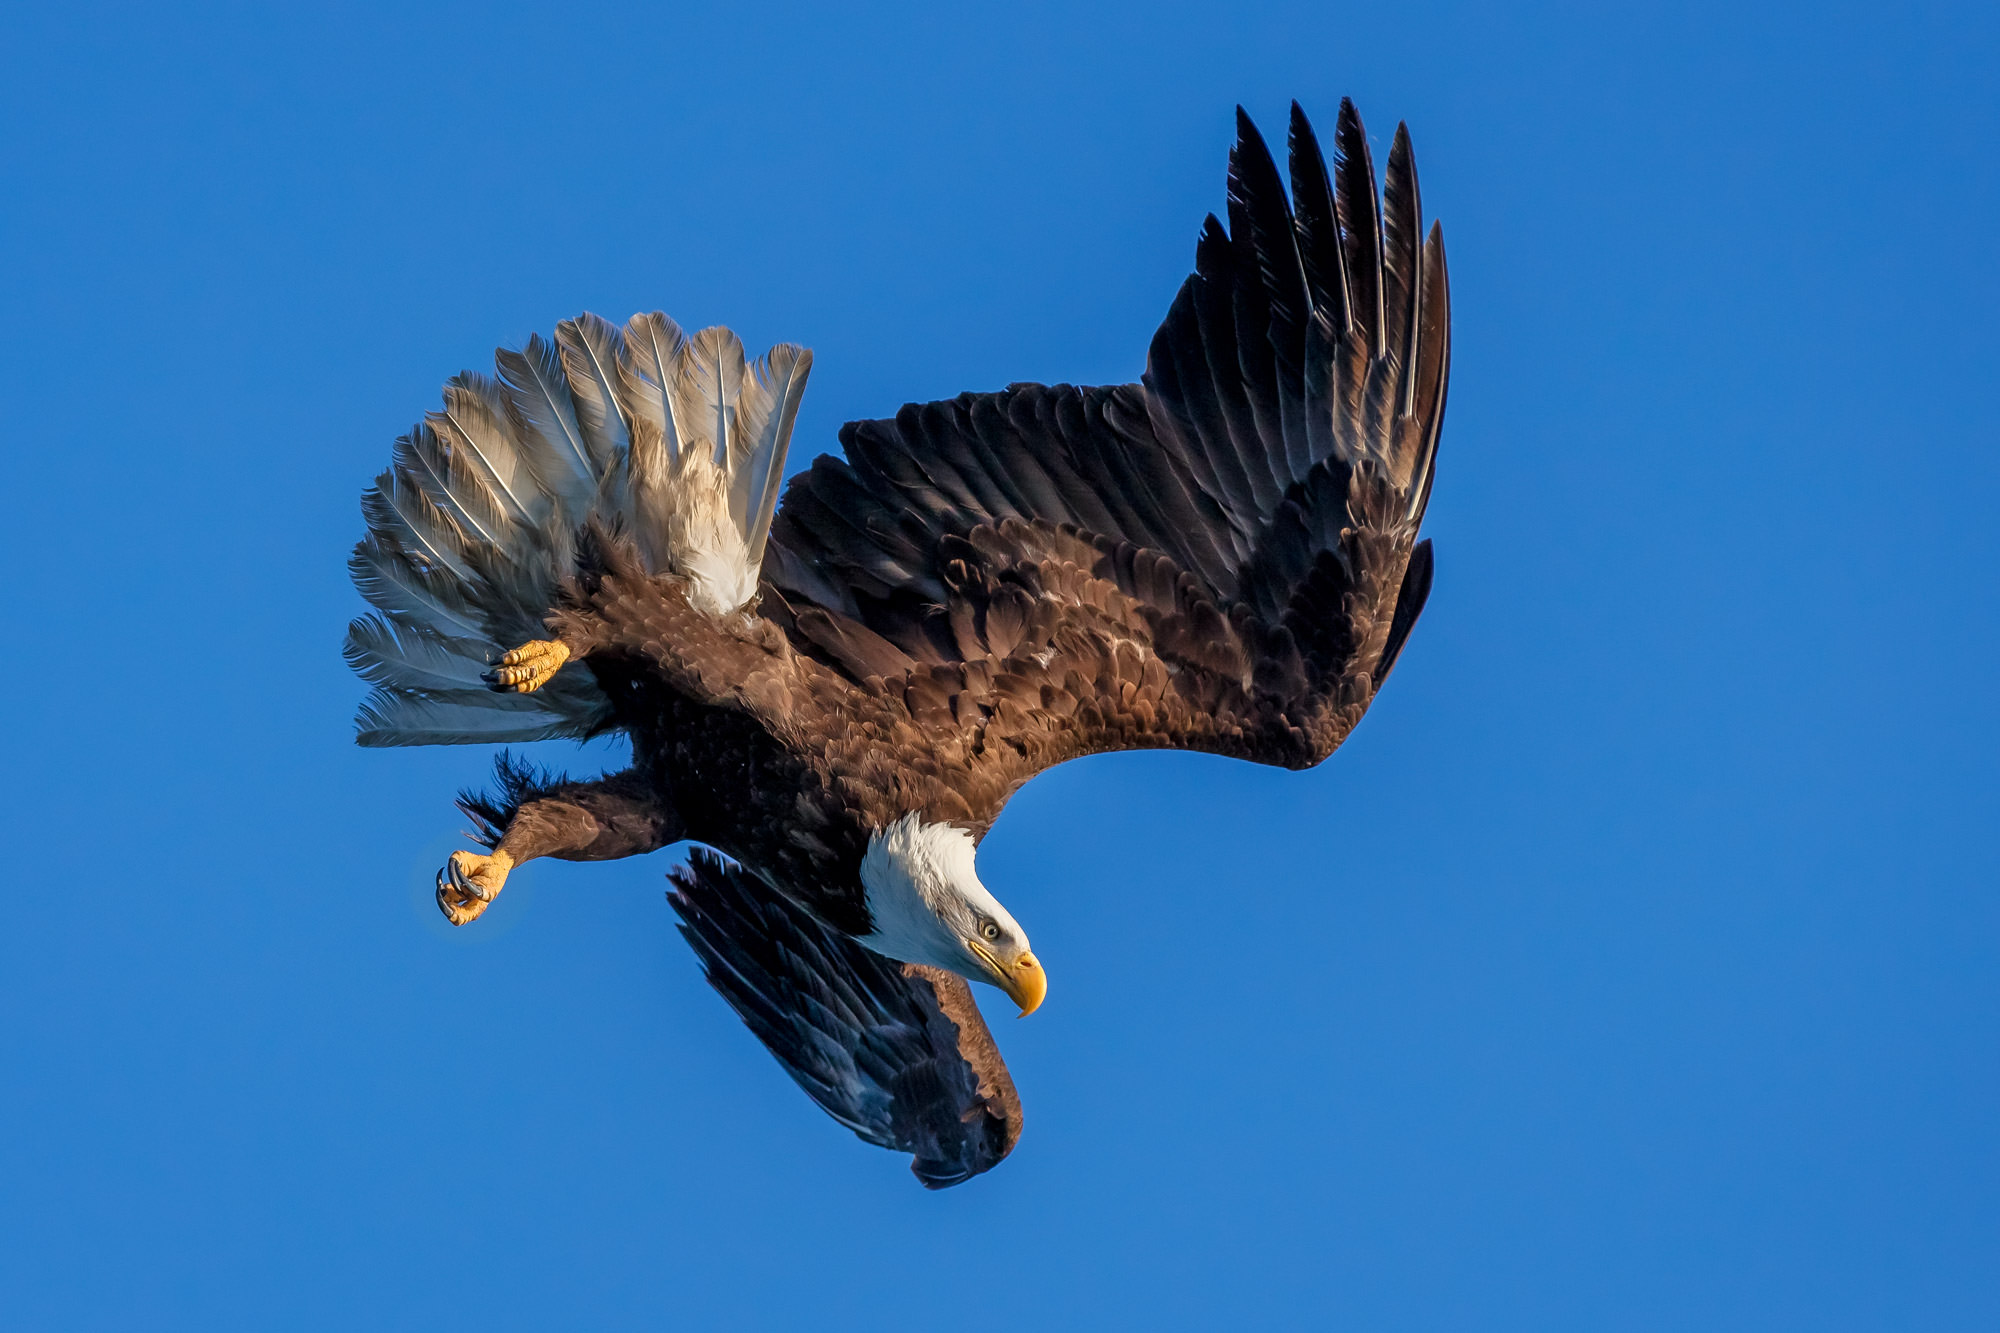 Eagle, Bald Eagle, flight, flying, photo